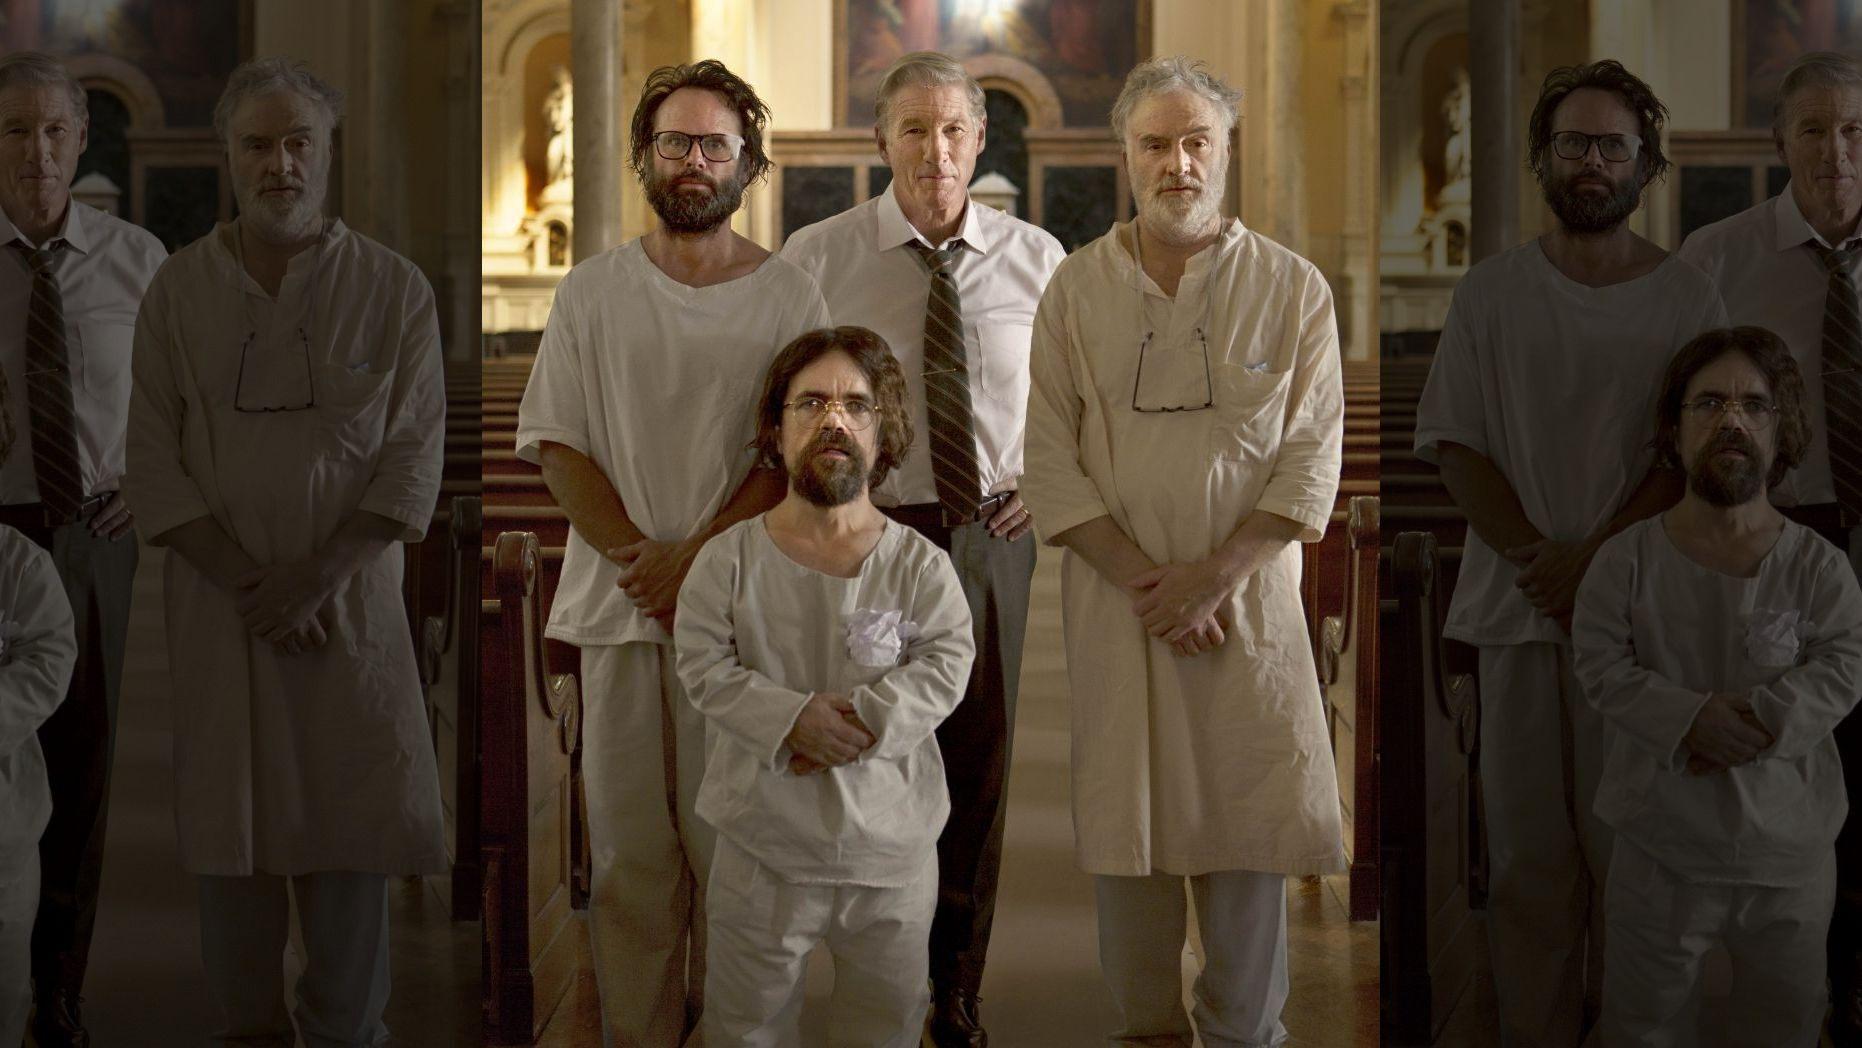 richard gere talks three christs film and mental health